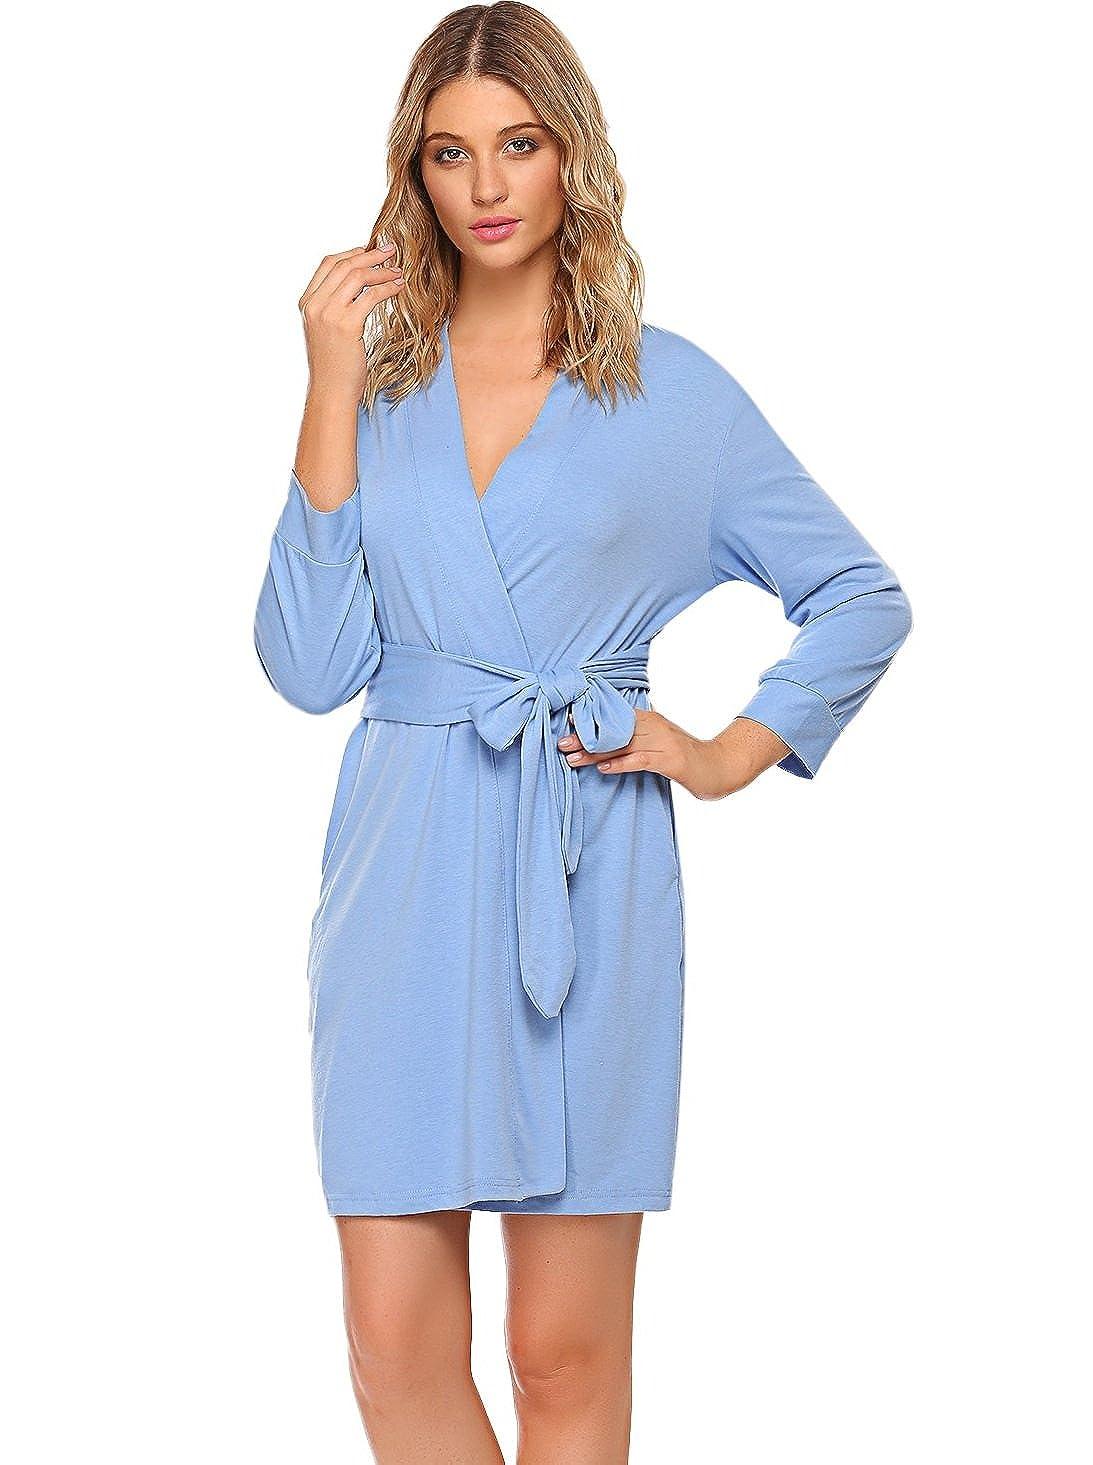 MAXMODA Women Cotton Robe Kimono Spa Bathrobe Lightweight Short Sleepwear Nightwear S-XXL